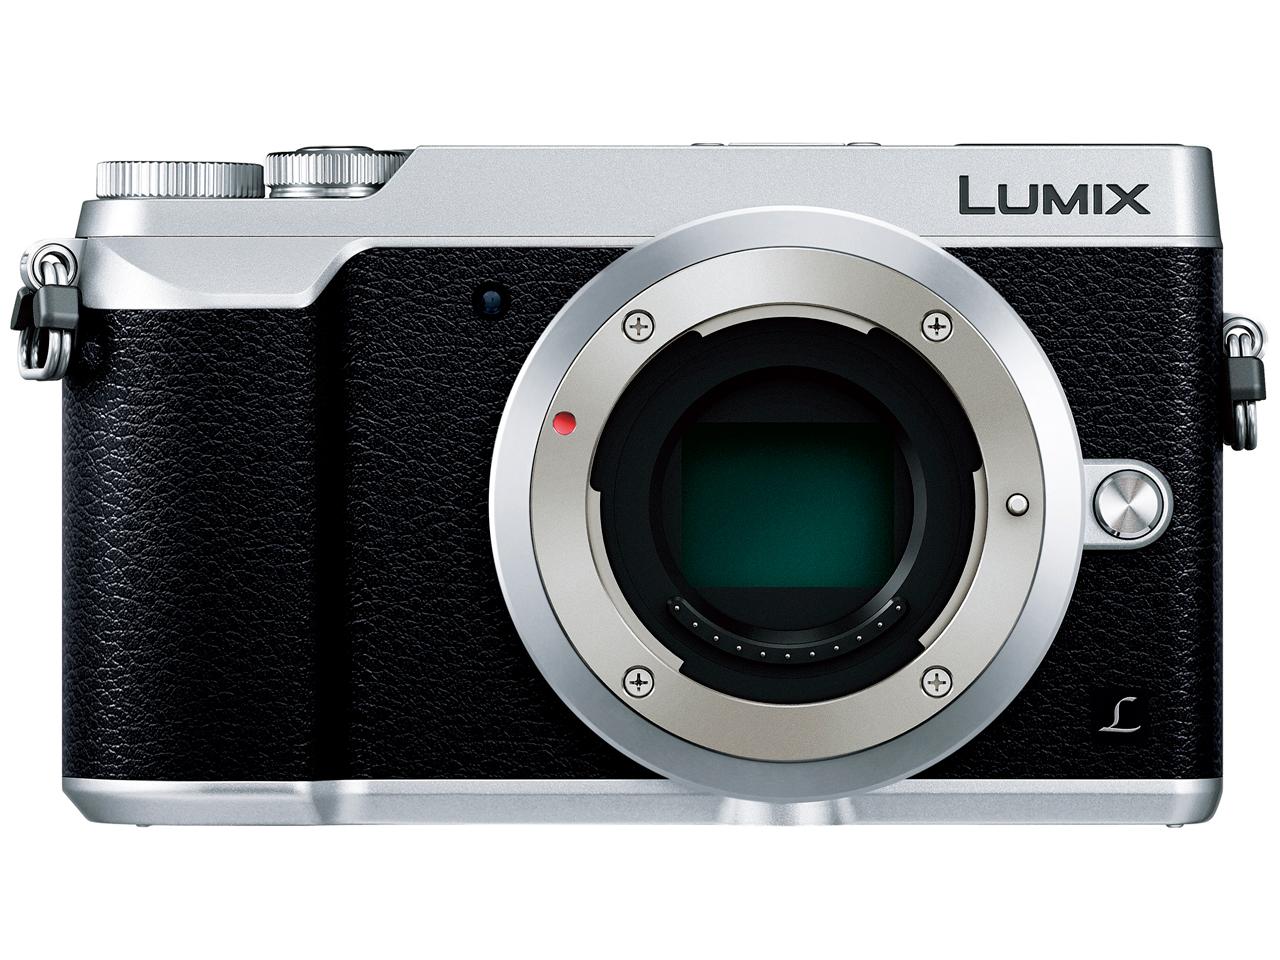 Panasonic DMC-GX7MK2-S Panasonic LUMIX DMC-GX7MK2-S ボディ LUMIX シルバー, 通販天国:665608ef --- m2cweb.com